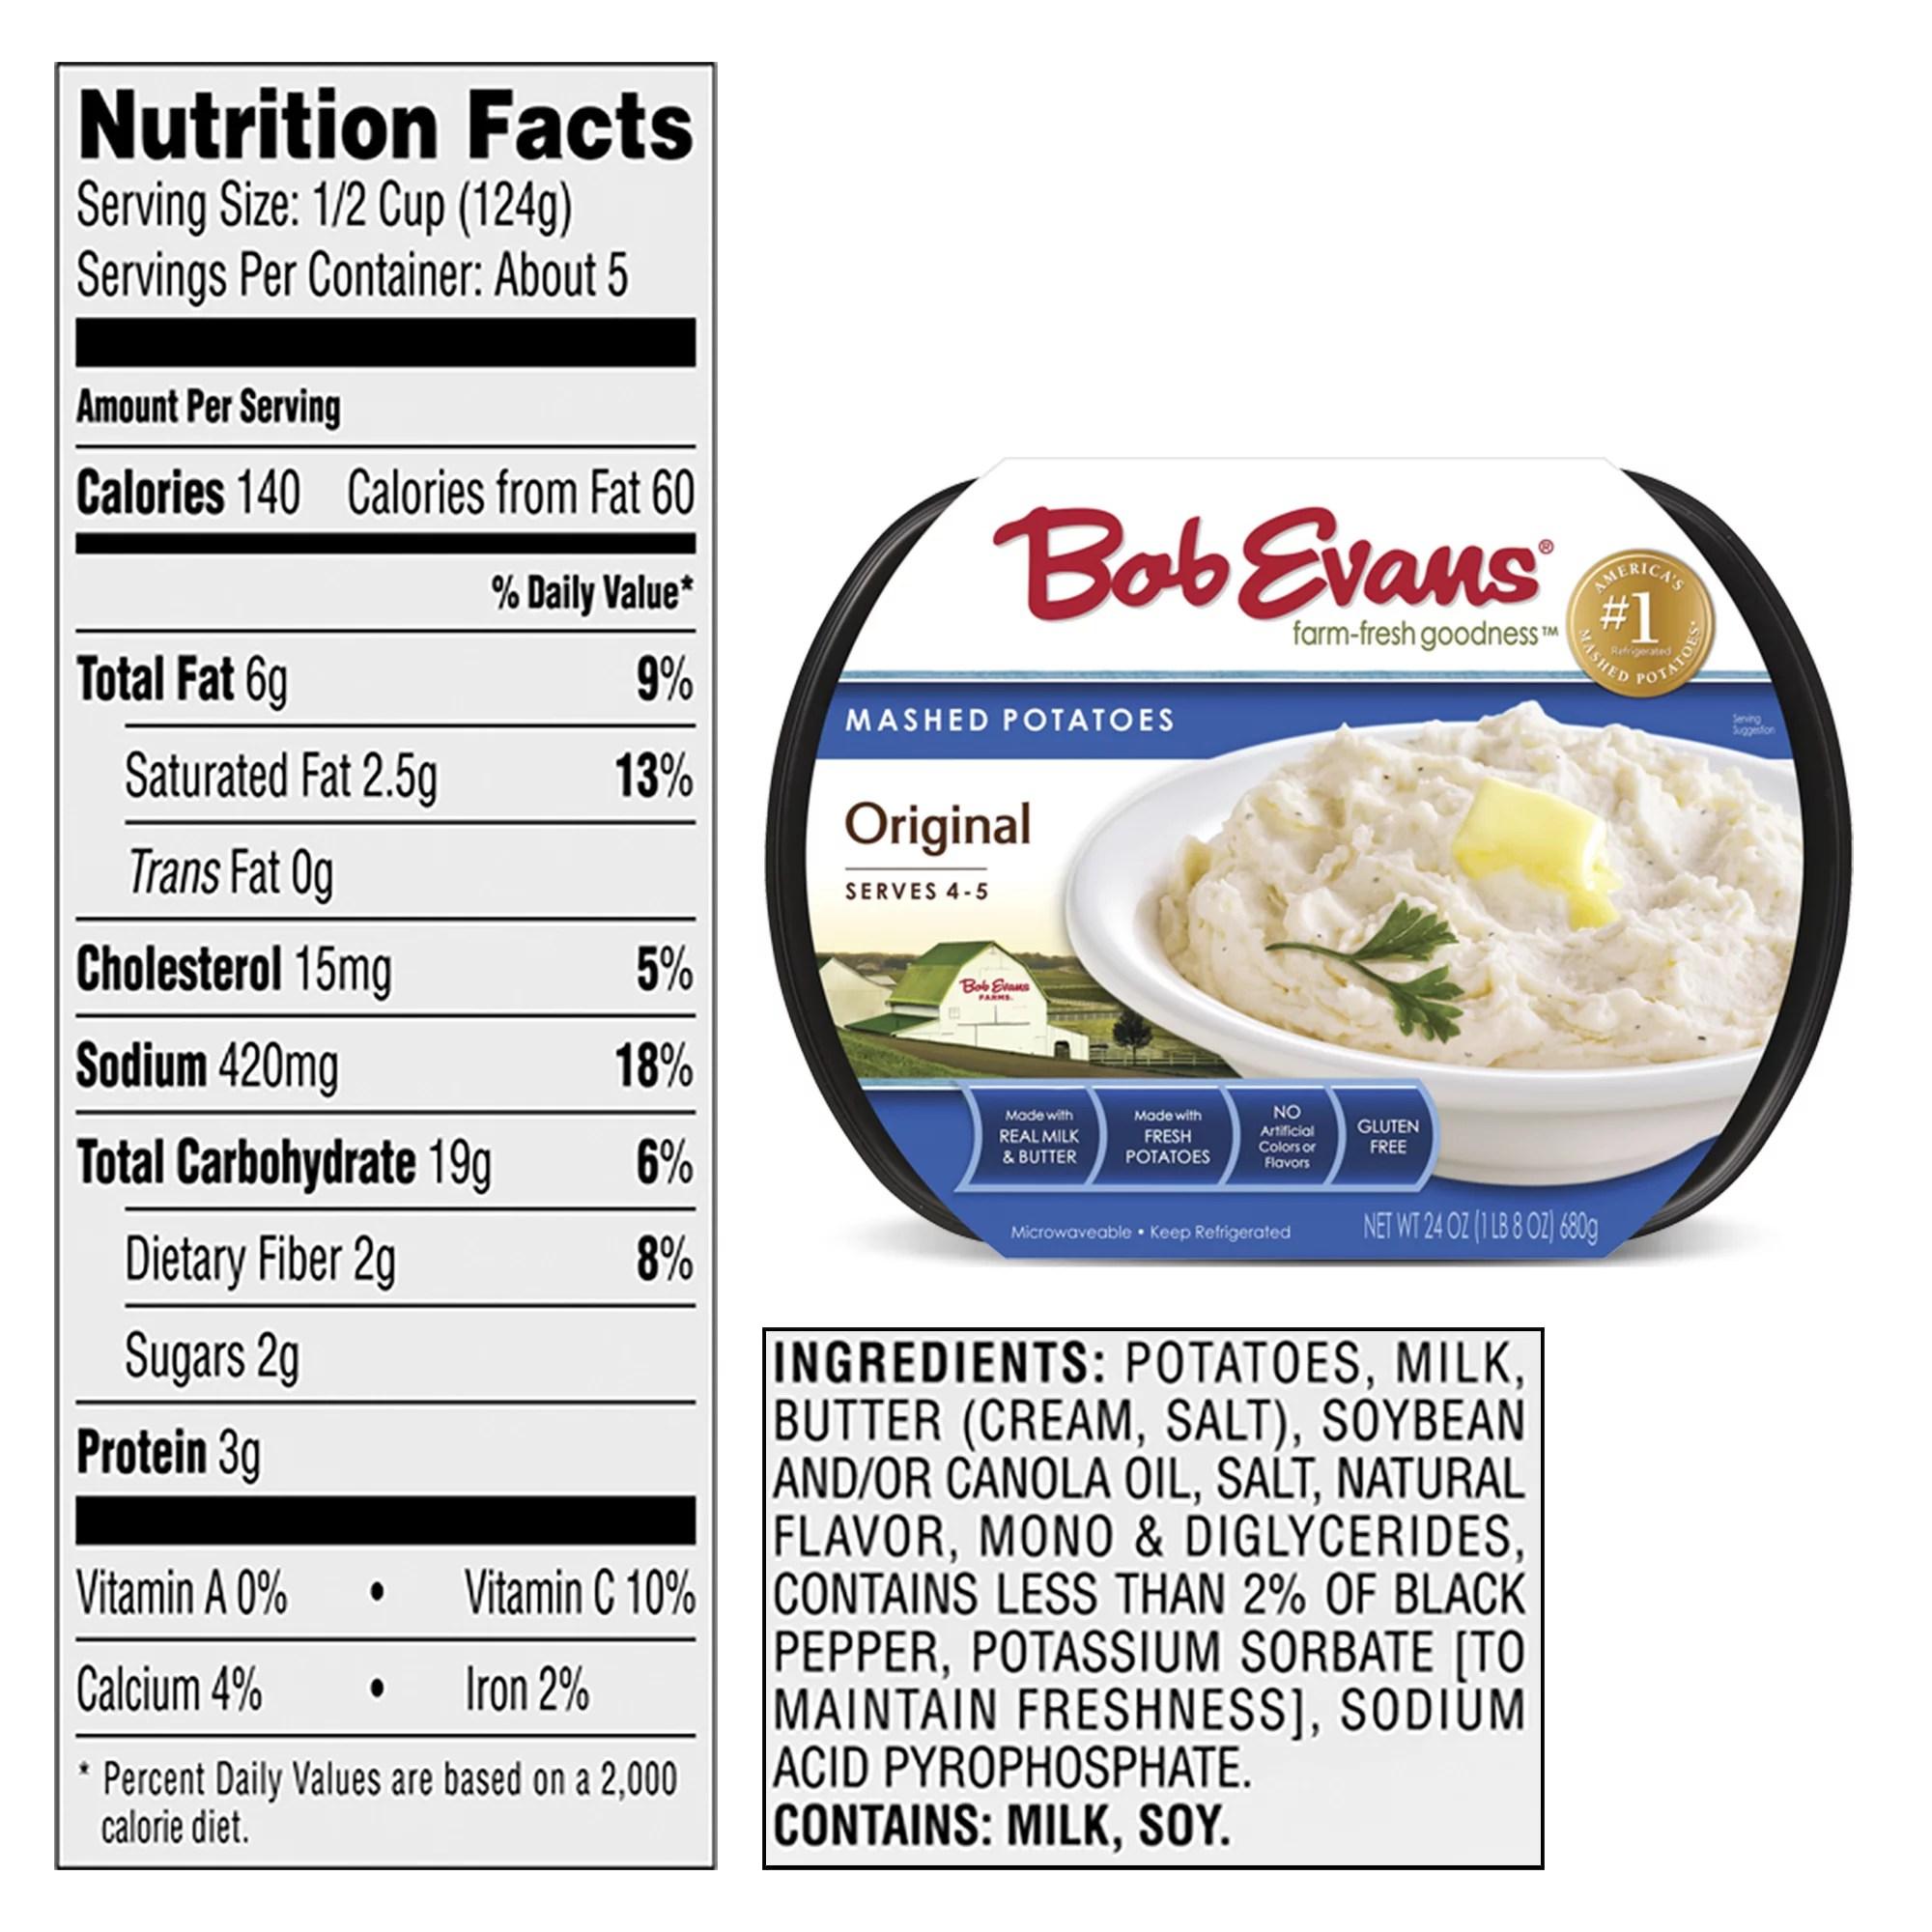 bob evans original mashed potatoes 24 oz pack of 1